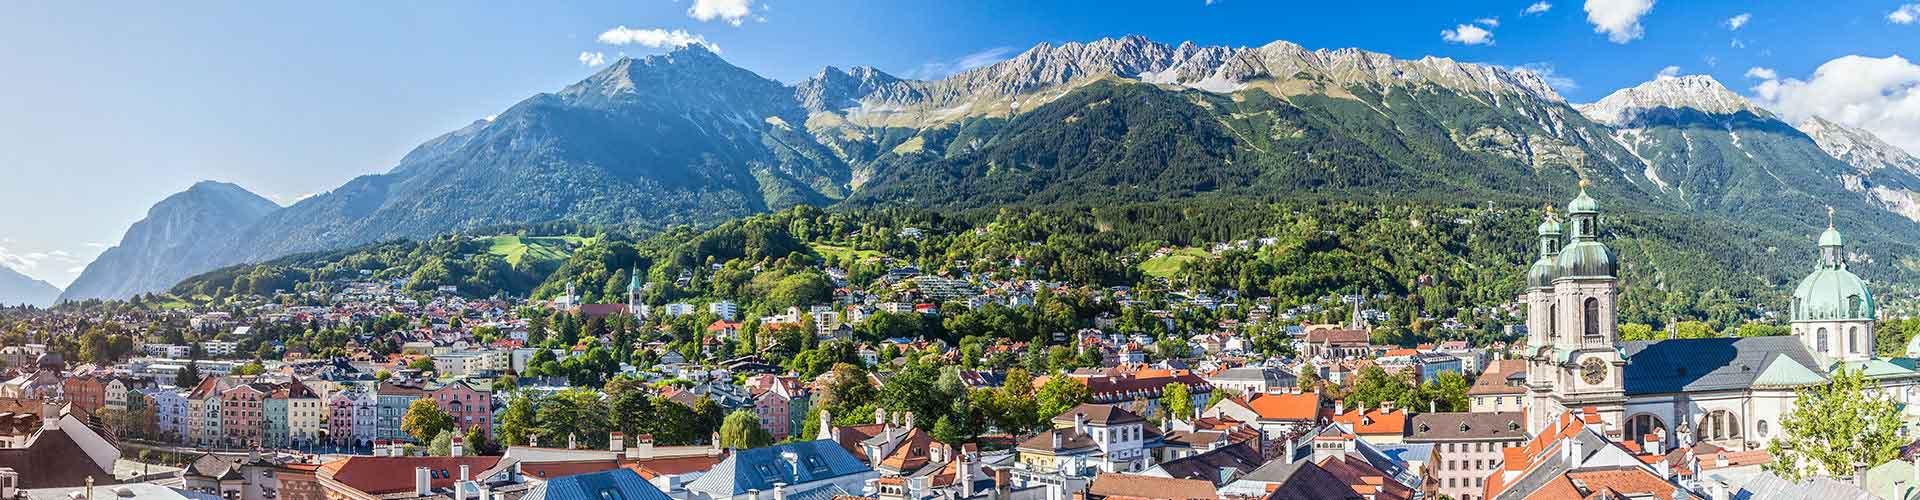 Innsbruck - Hôtels à Innsbruck. Cartes pour Innsbruck, photos et commentaires pour chaque hôtel à Innsbruck.